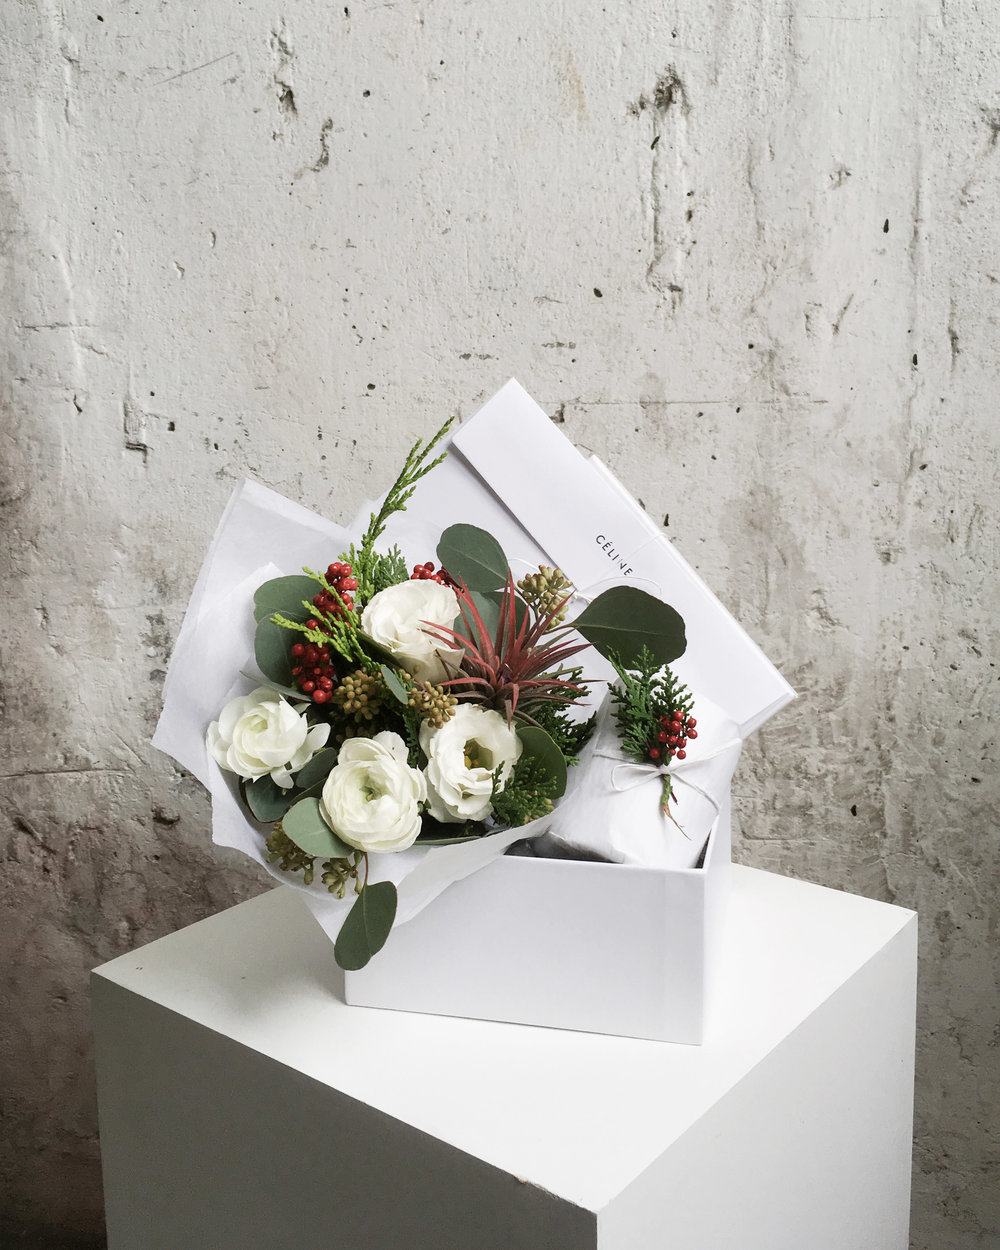 Tailor Designed Gift -